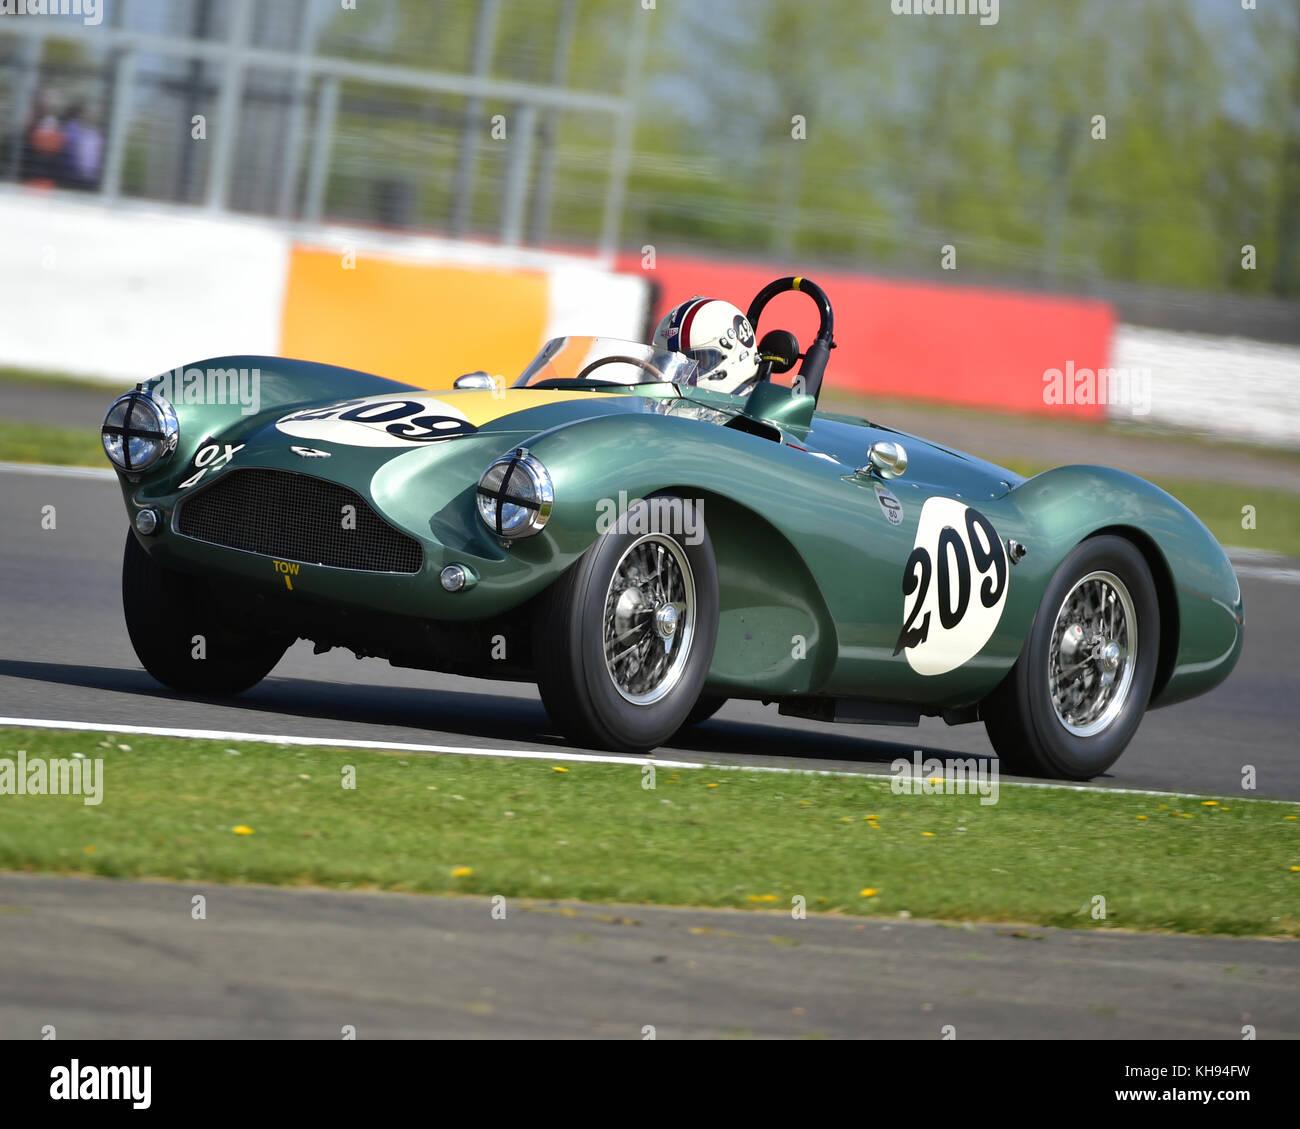 Steven Boultbee-Brooks, Aston Martin DB 3 S, FISCAR, Tom Cole Trophäe, VSCC, Formel Vintage, Runde 1, Silverstone, Stockbild